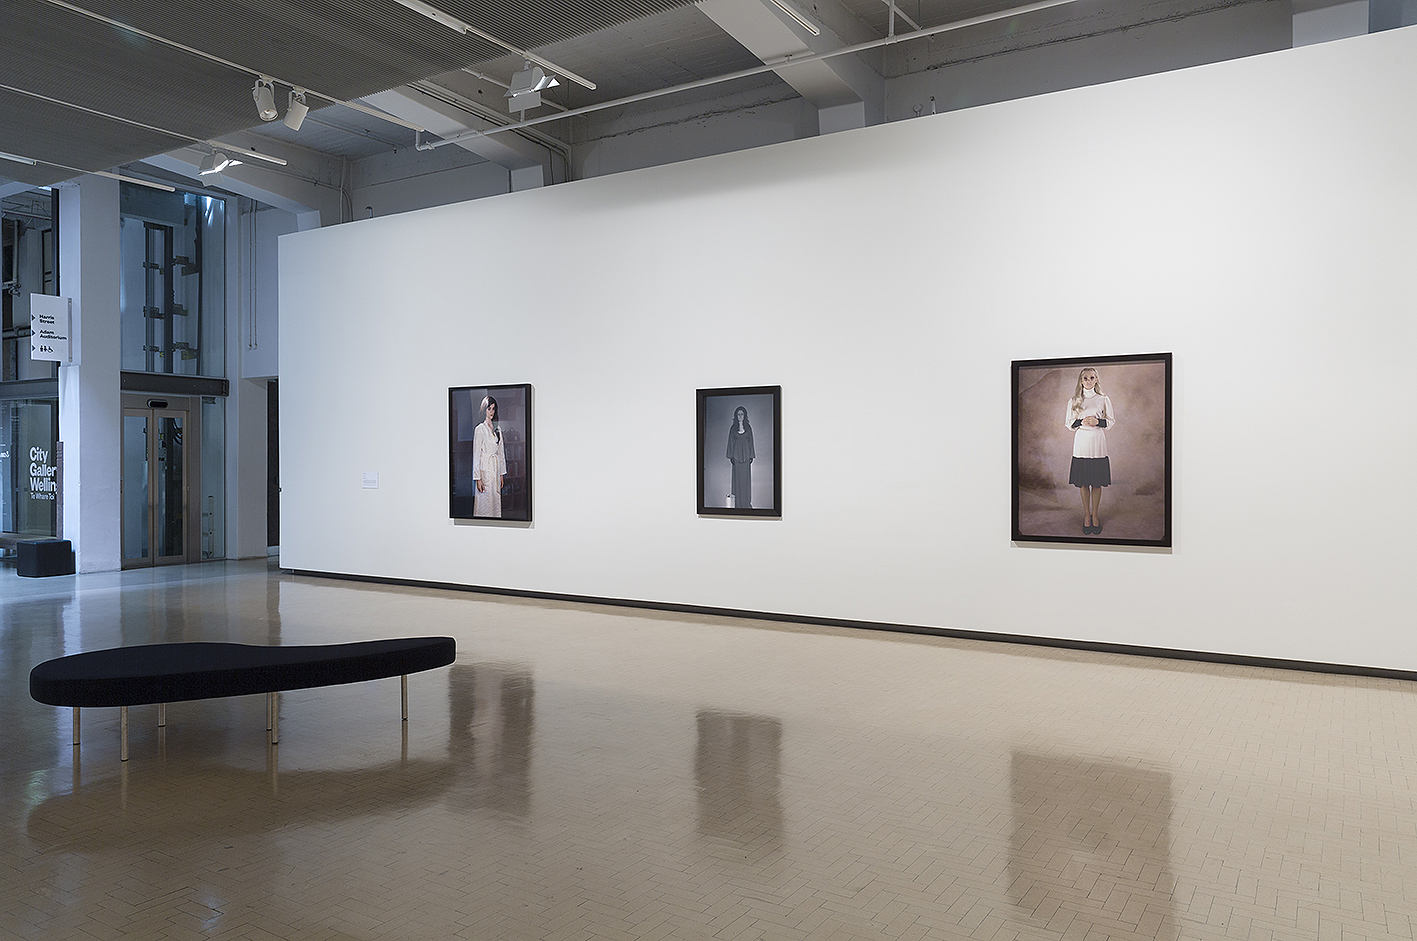 City Gallery_Yvonne Todd_Creamy Psychology_documentation_hiRez_024.jpg